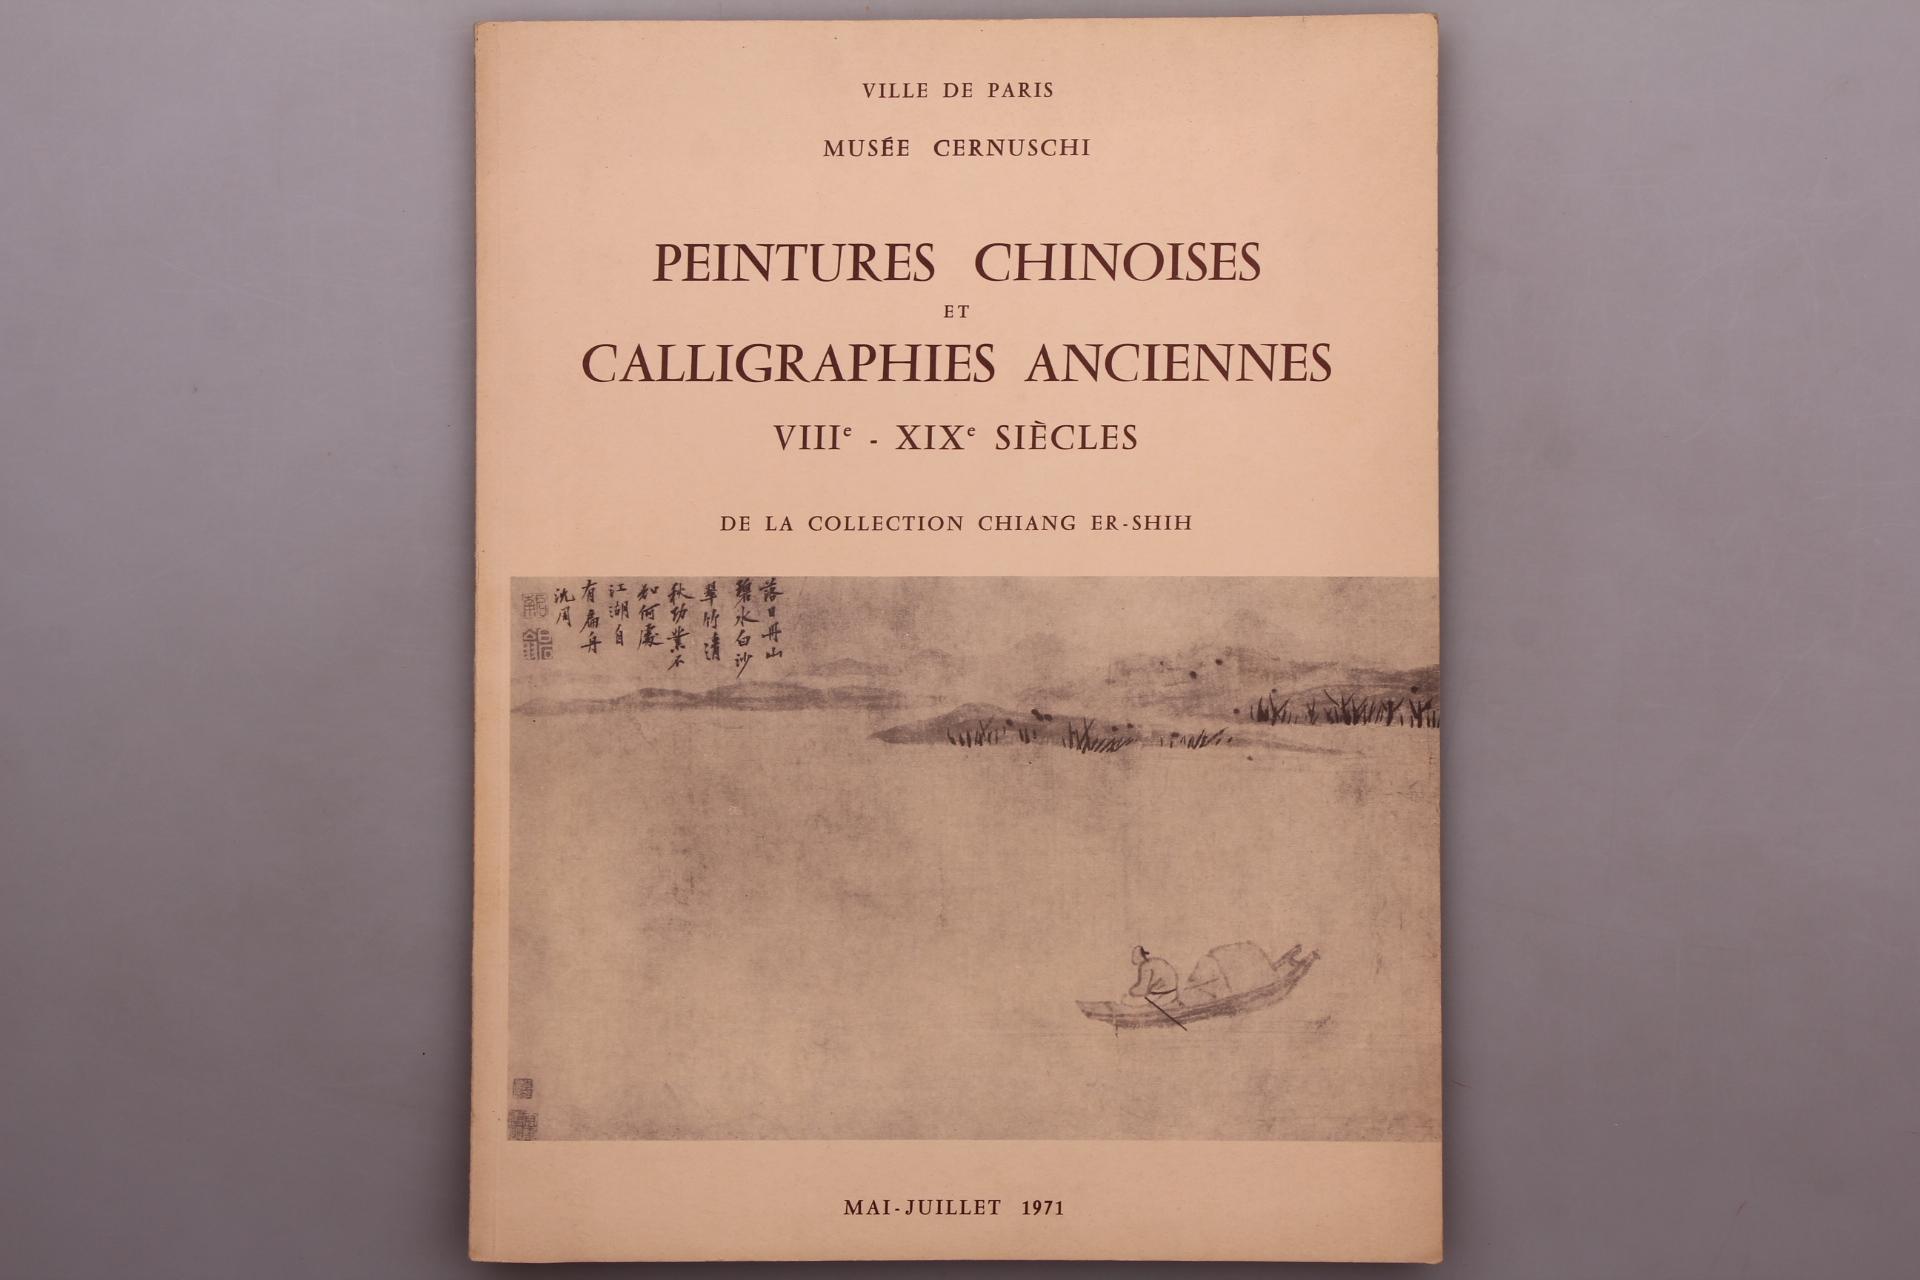 PEINTURES CHINOISES ET CALLIGRAPHIES ANCIENNES